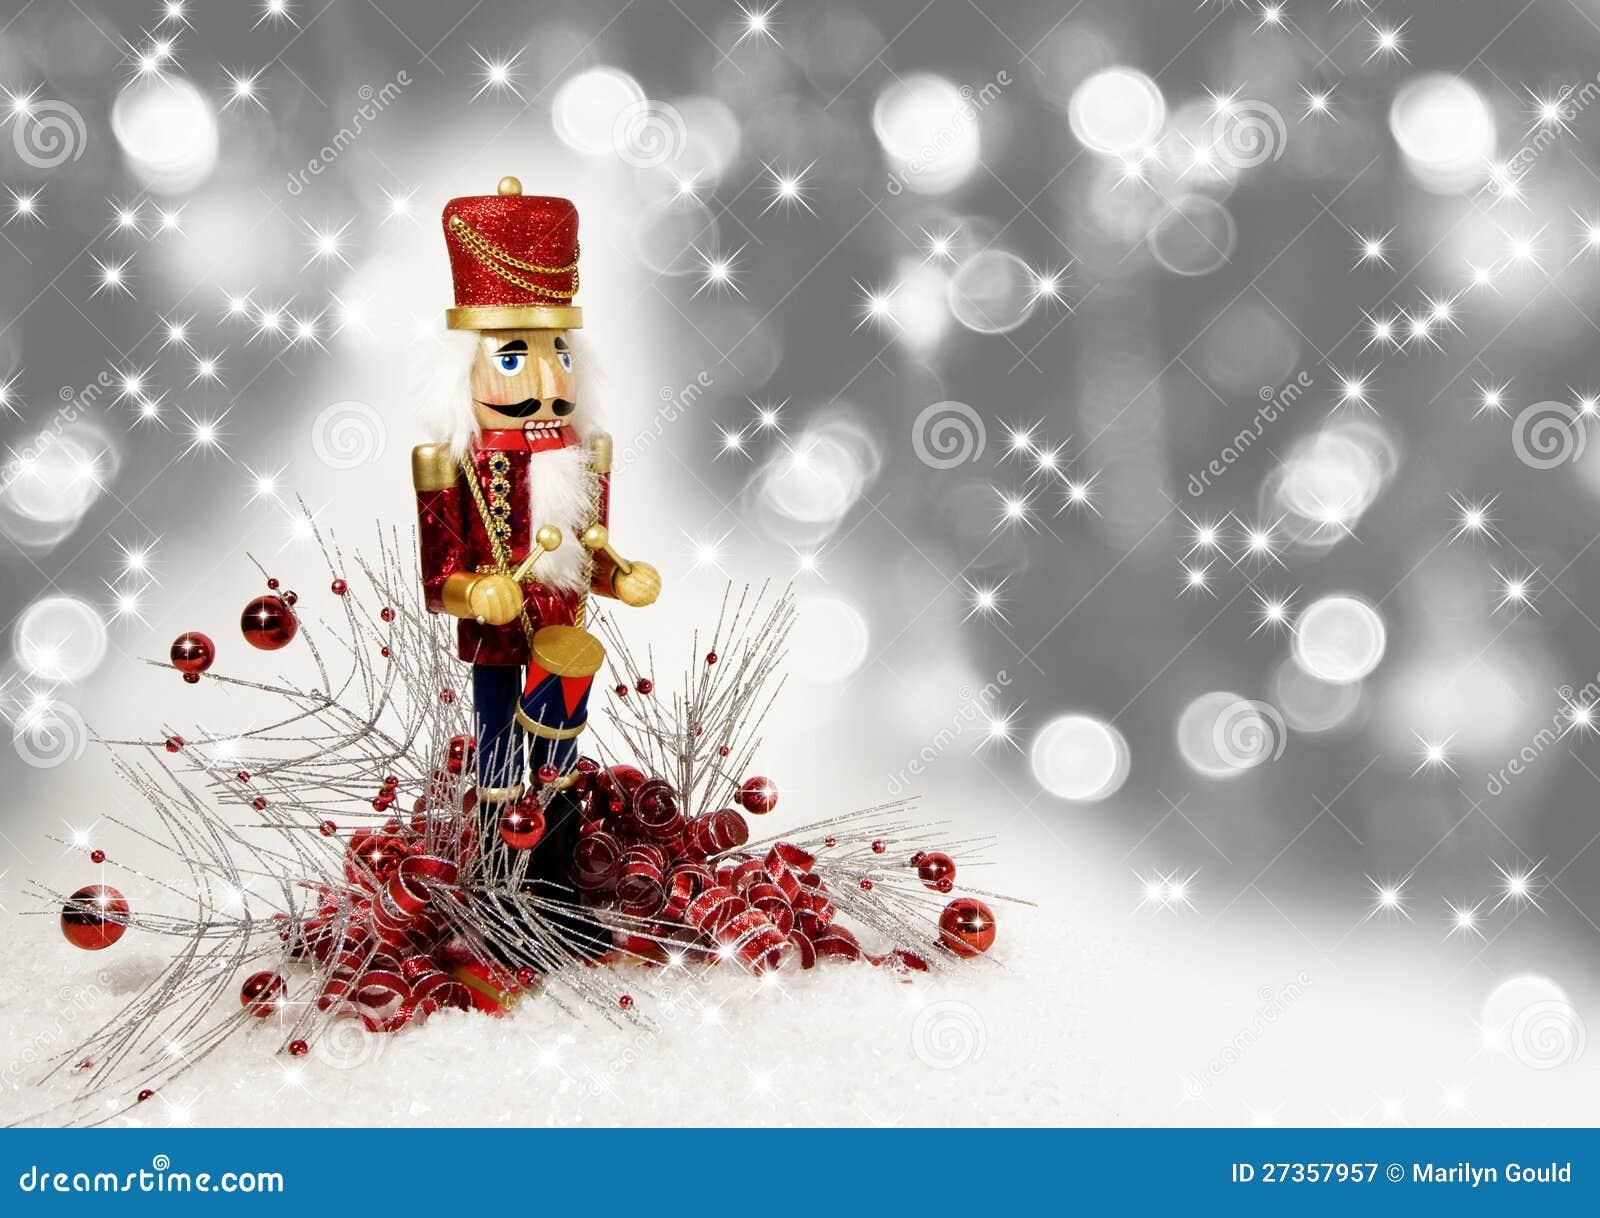 Christmas Nutcracker Drummer Royalty Free Stock Photography - Image ...